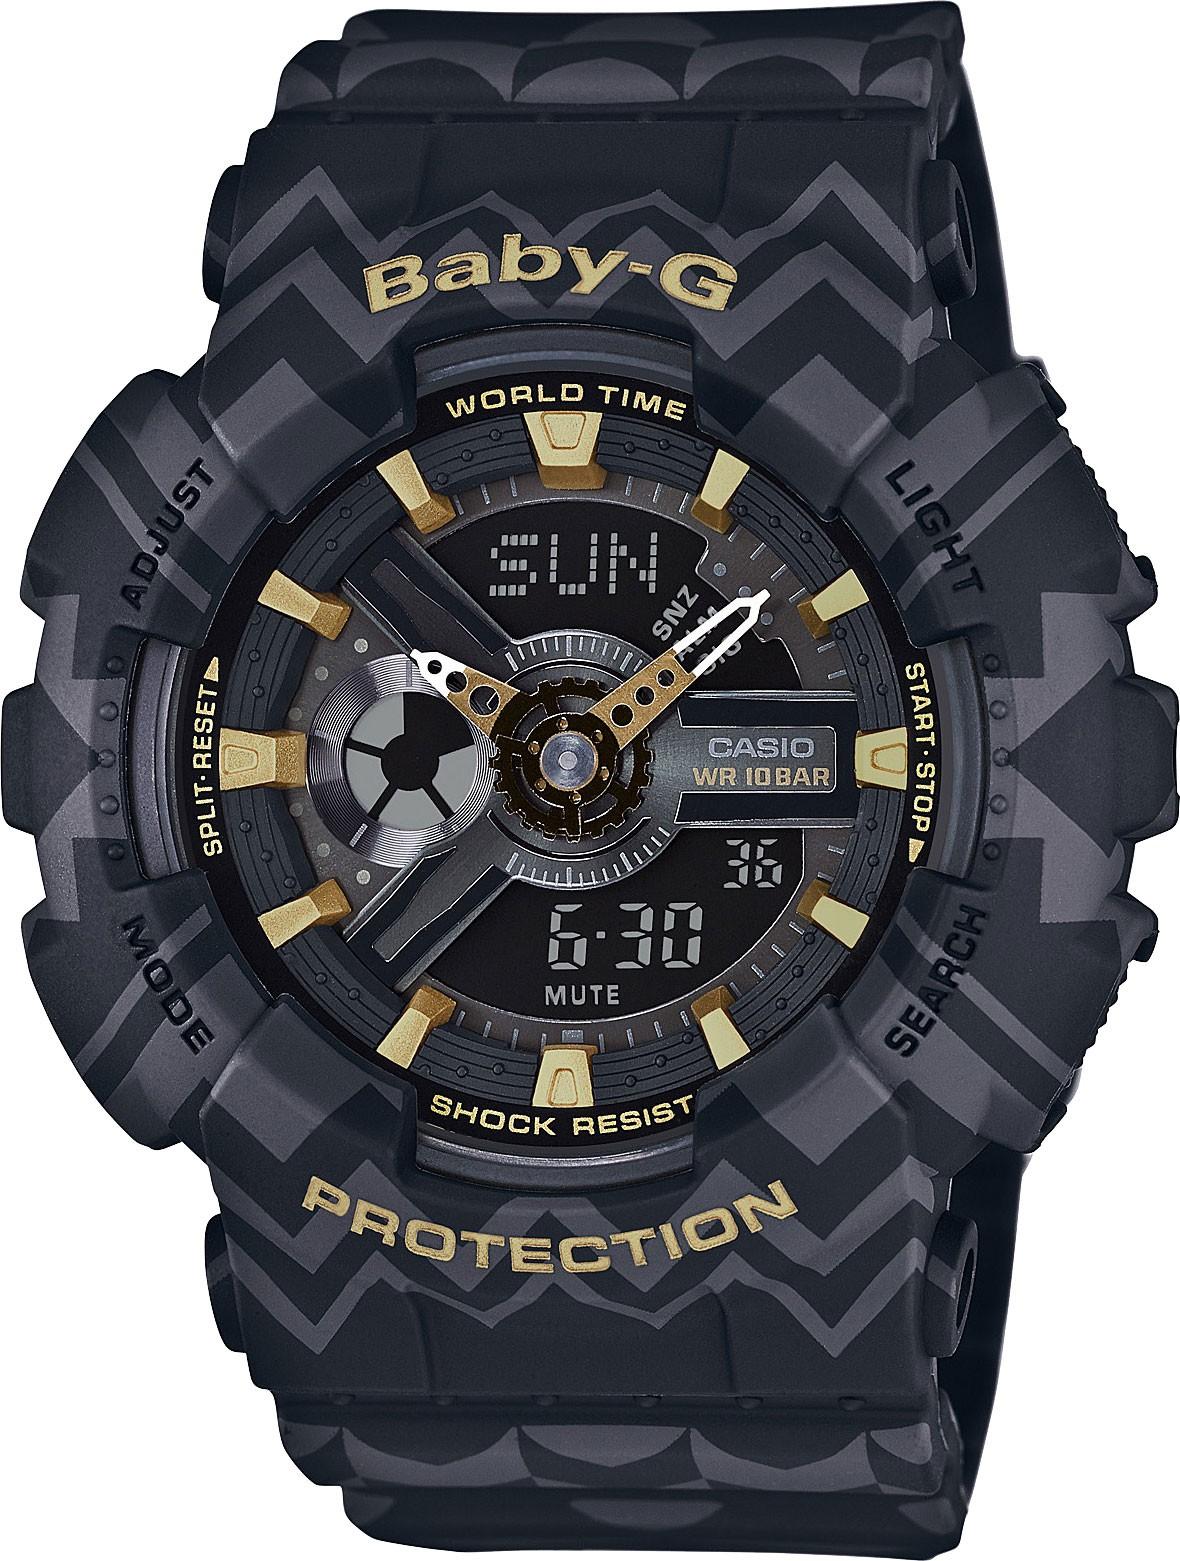 Женские часы Casio Baby-G BA-110TP-1AER